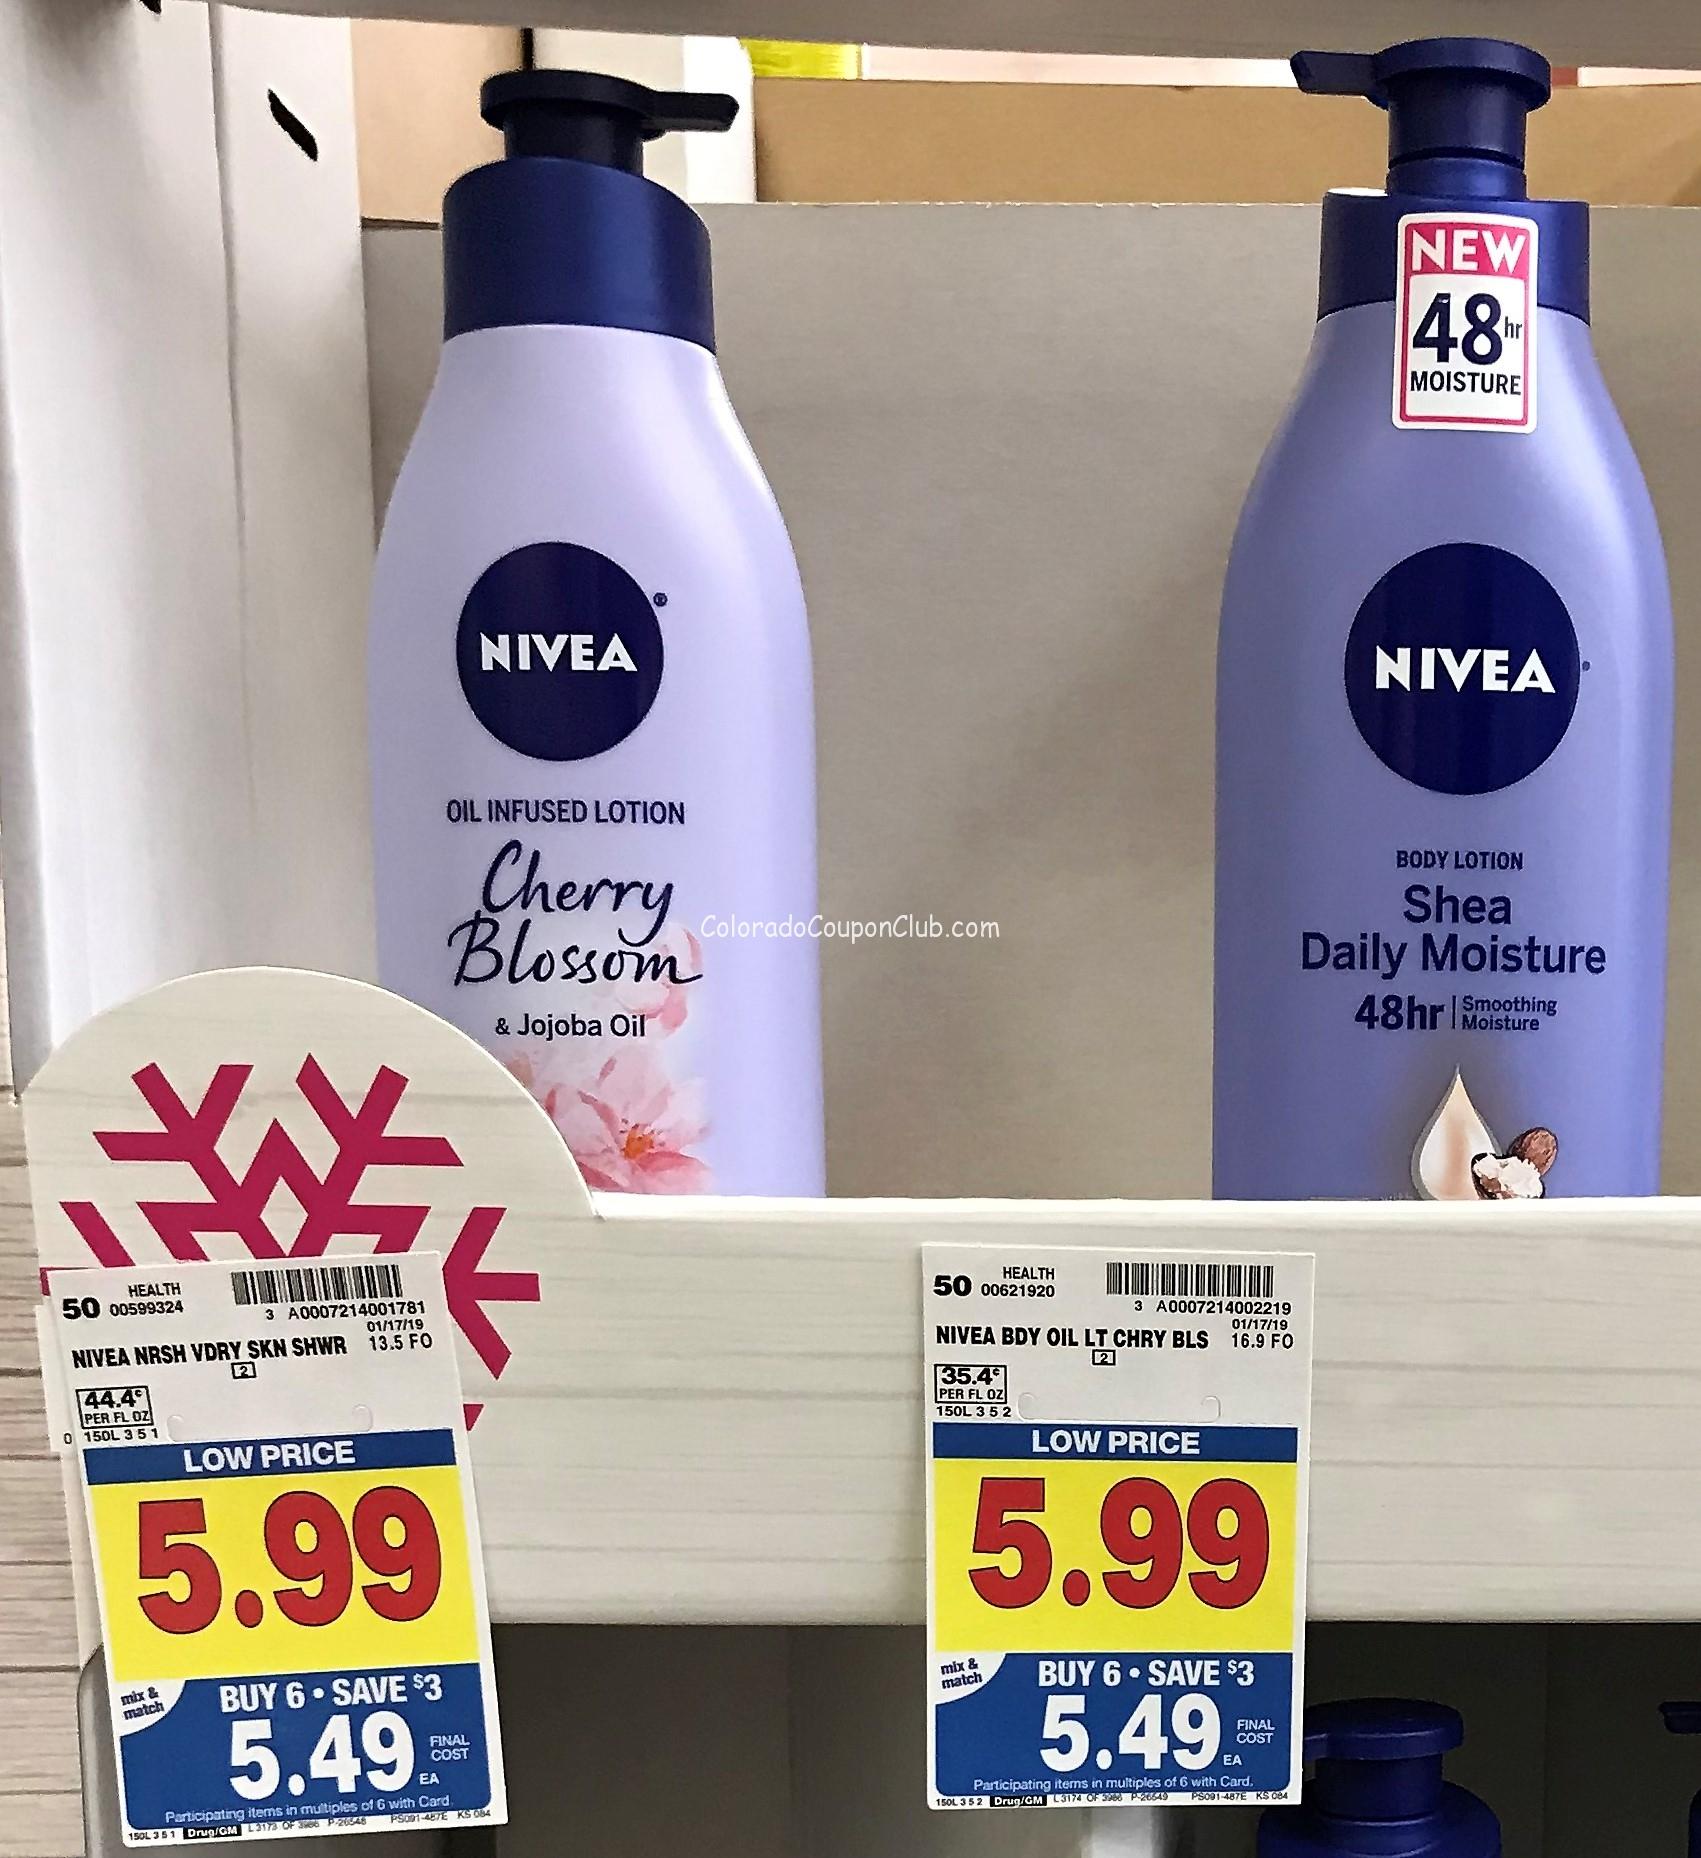 New Coupon! Nivea Body Lotion, Only $3.49 At King Soopers - Free Printable Nivea Coupons